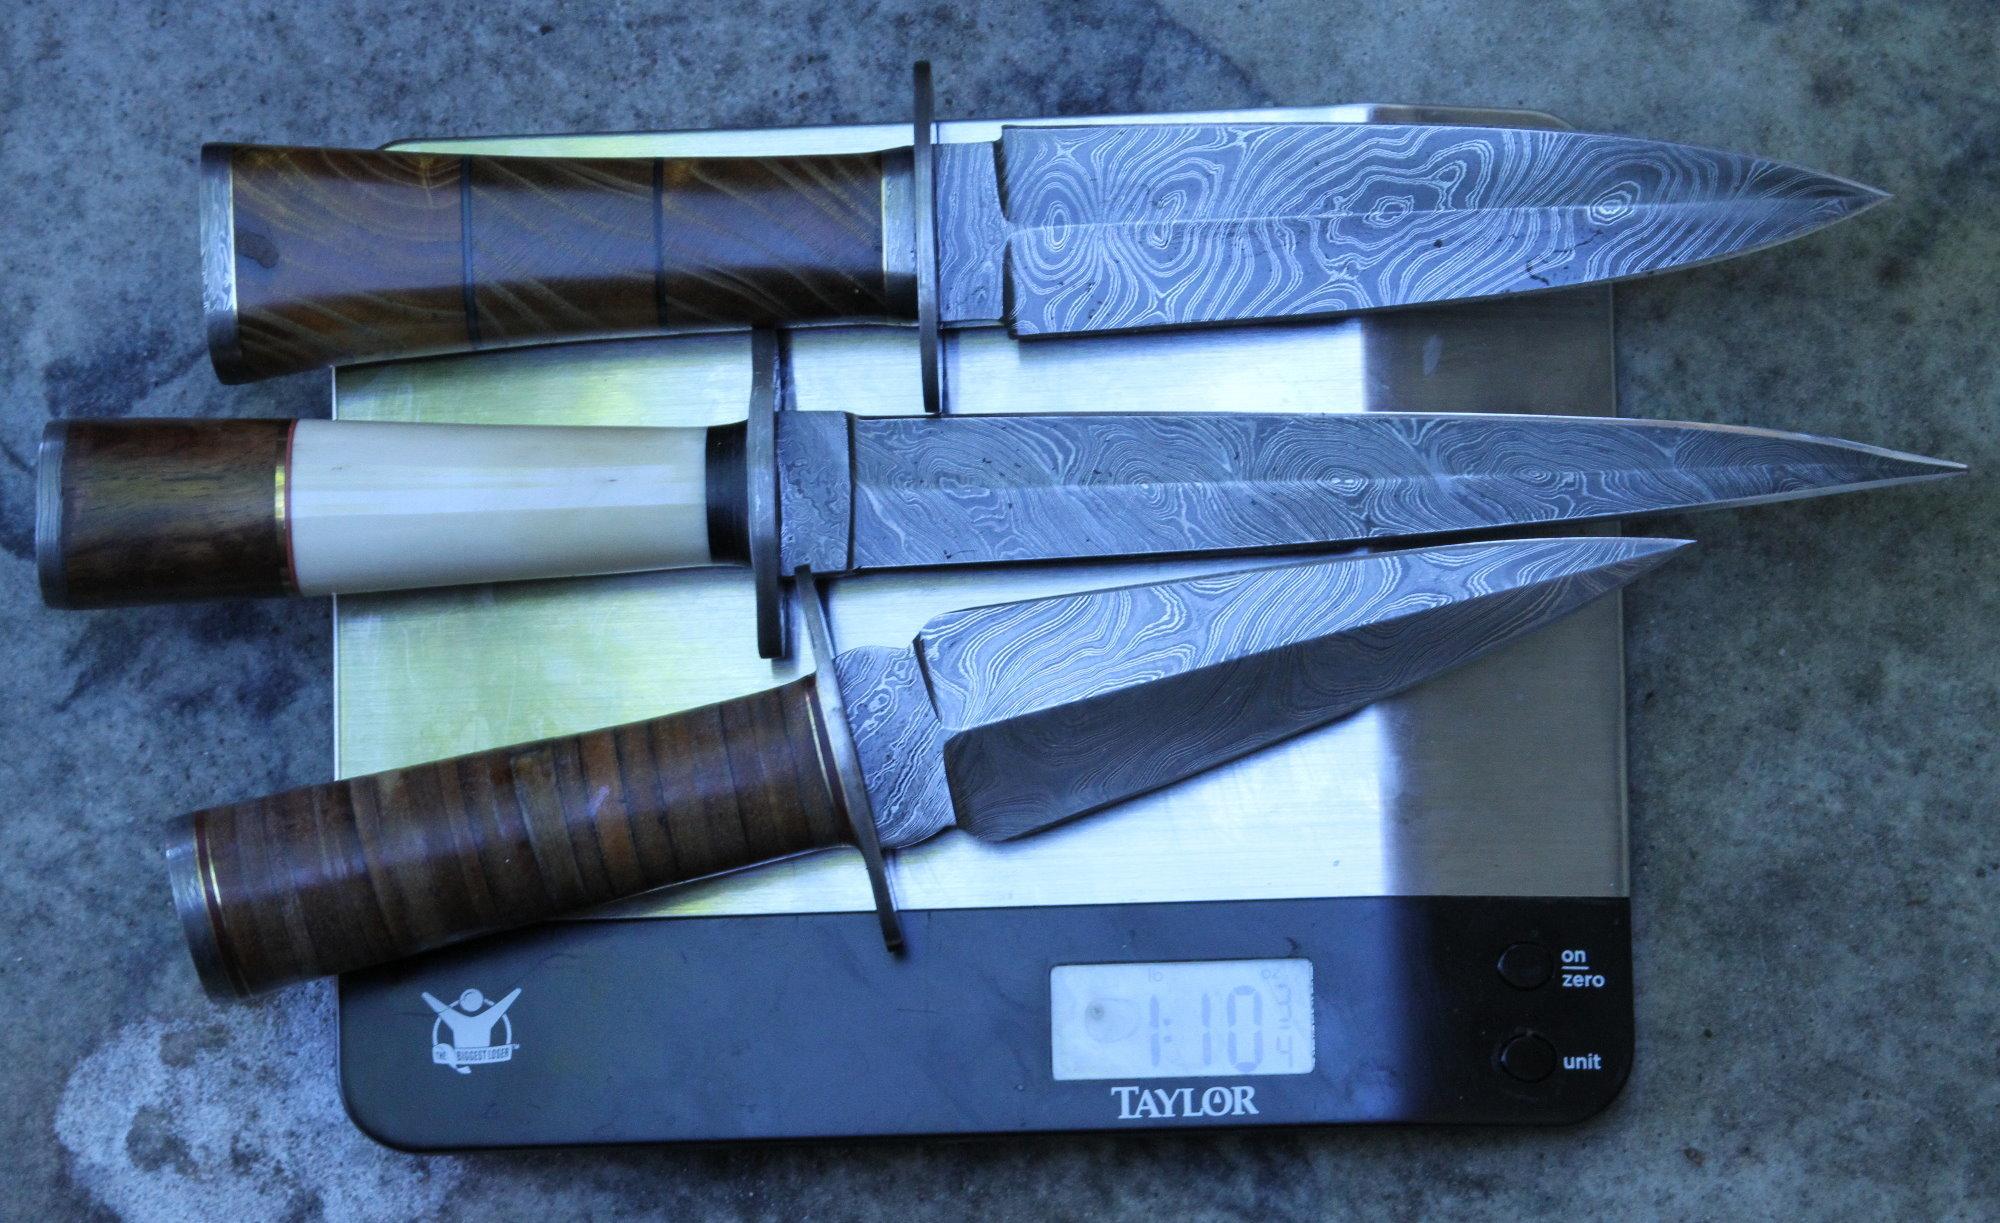 Cheap Damascus Knives for Christmas! - GunsAmerica Digest